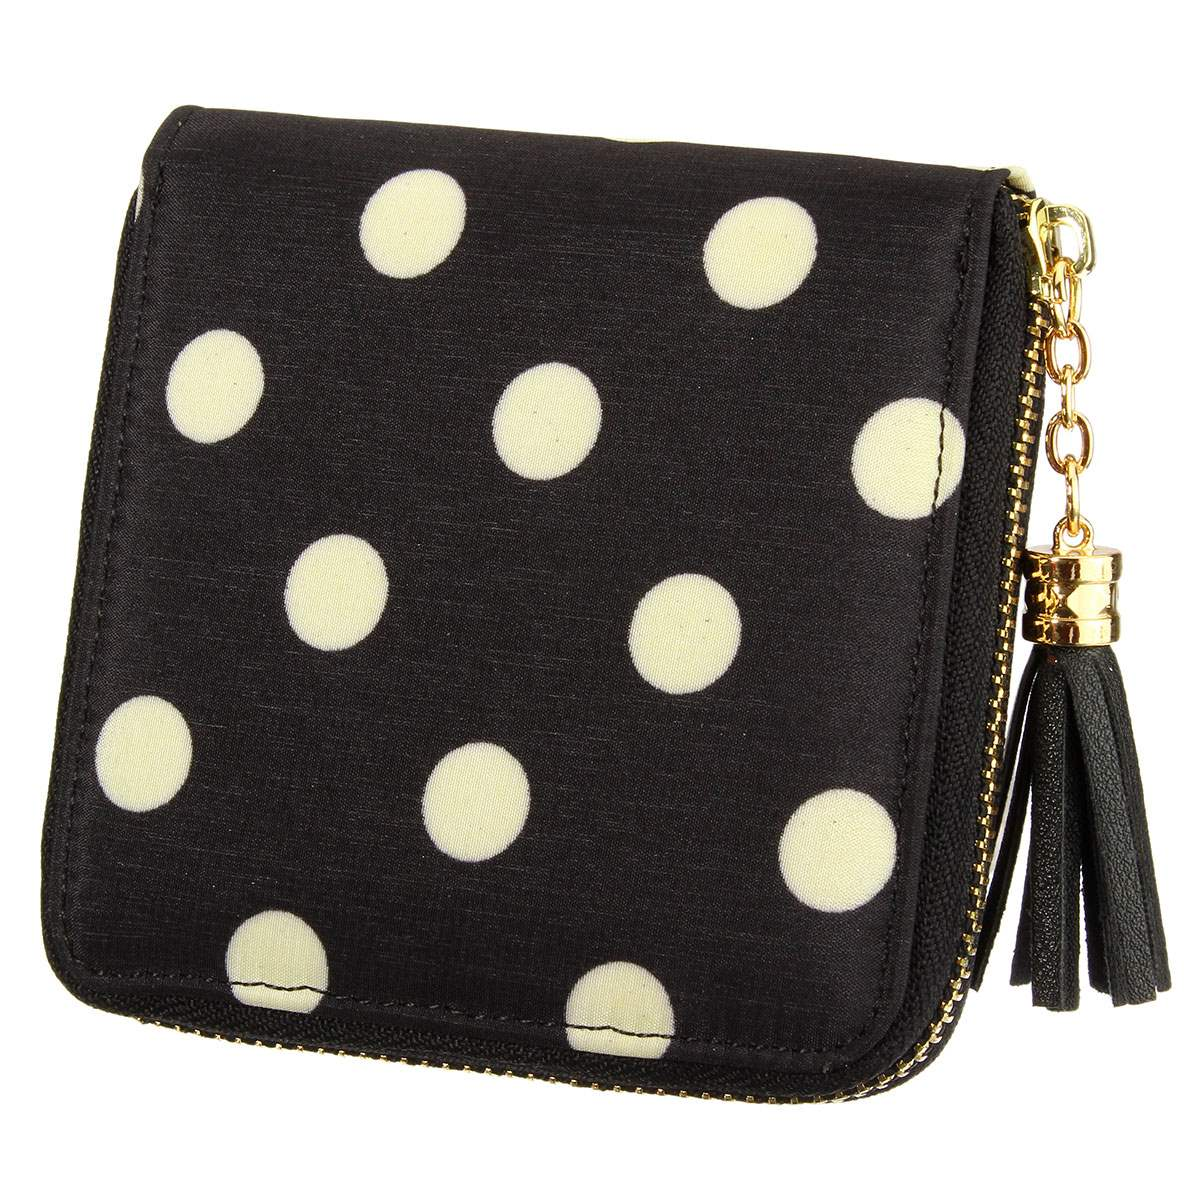 Osmond Women Wallets Leather Tassel Short Purses Ladies Bronzing Clutches  Dot Pattern Card Holder Small Wallet Mini Purse e514730a08